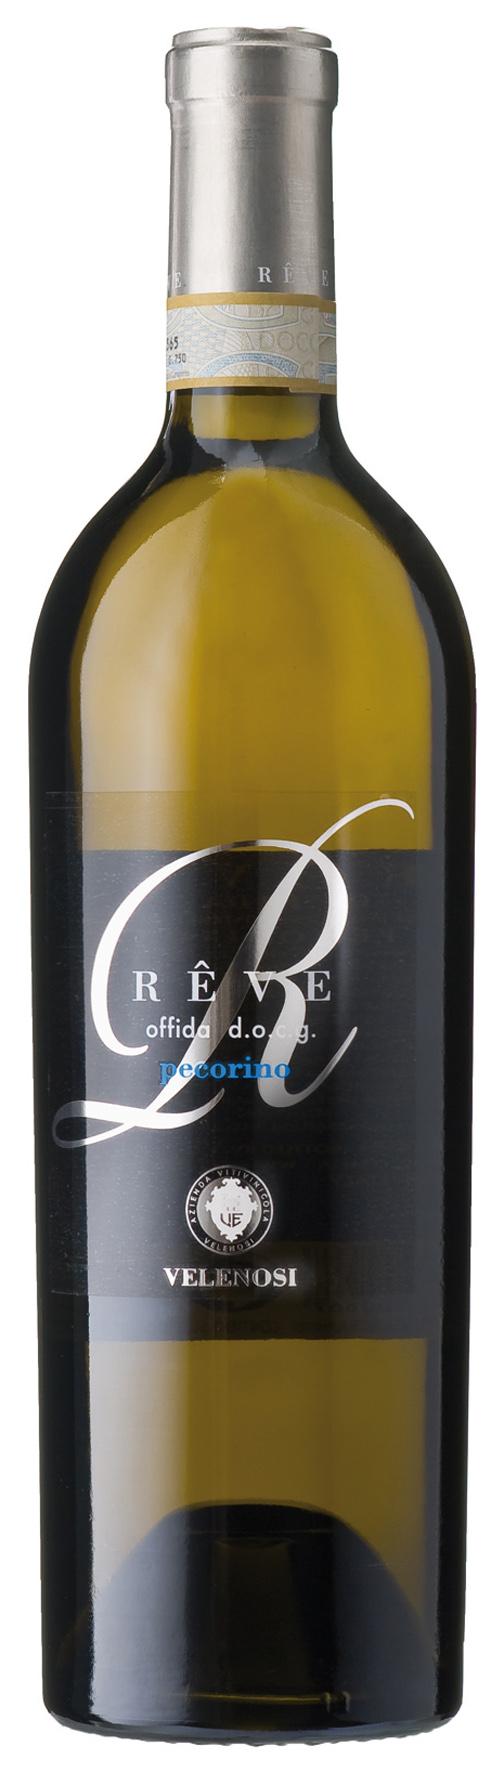 2014 Reve Offida DOC Pecorino Velenosi